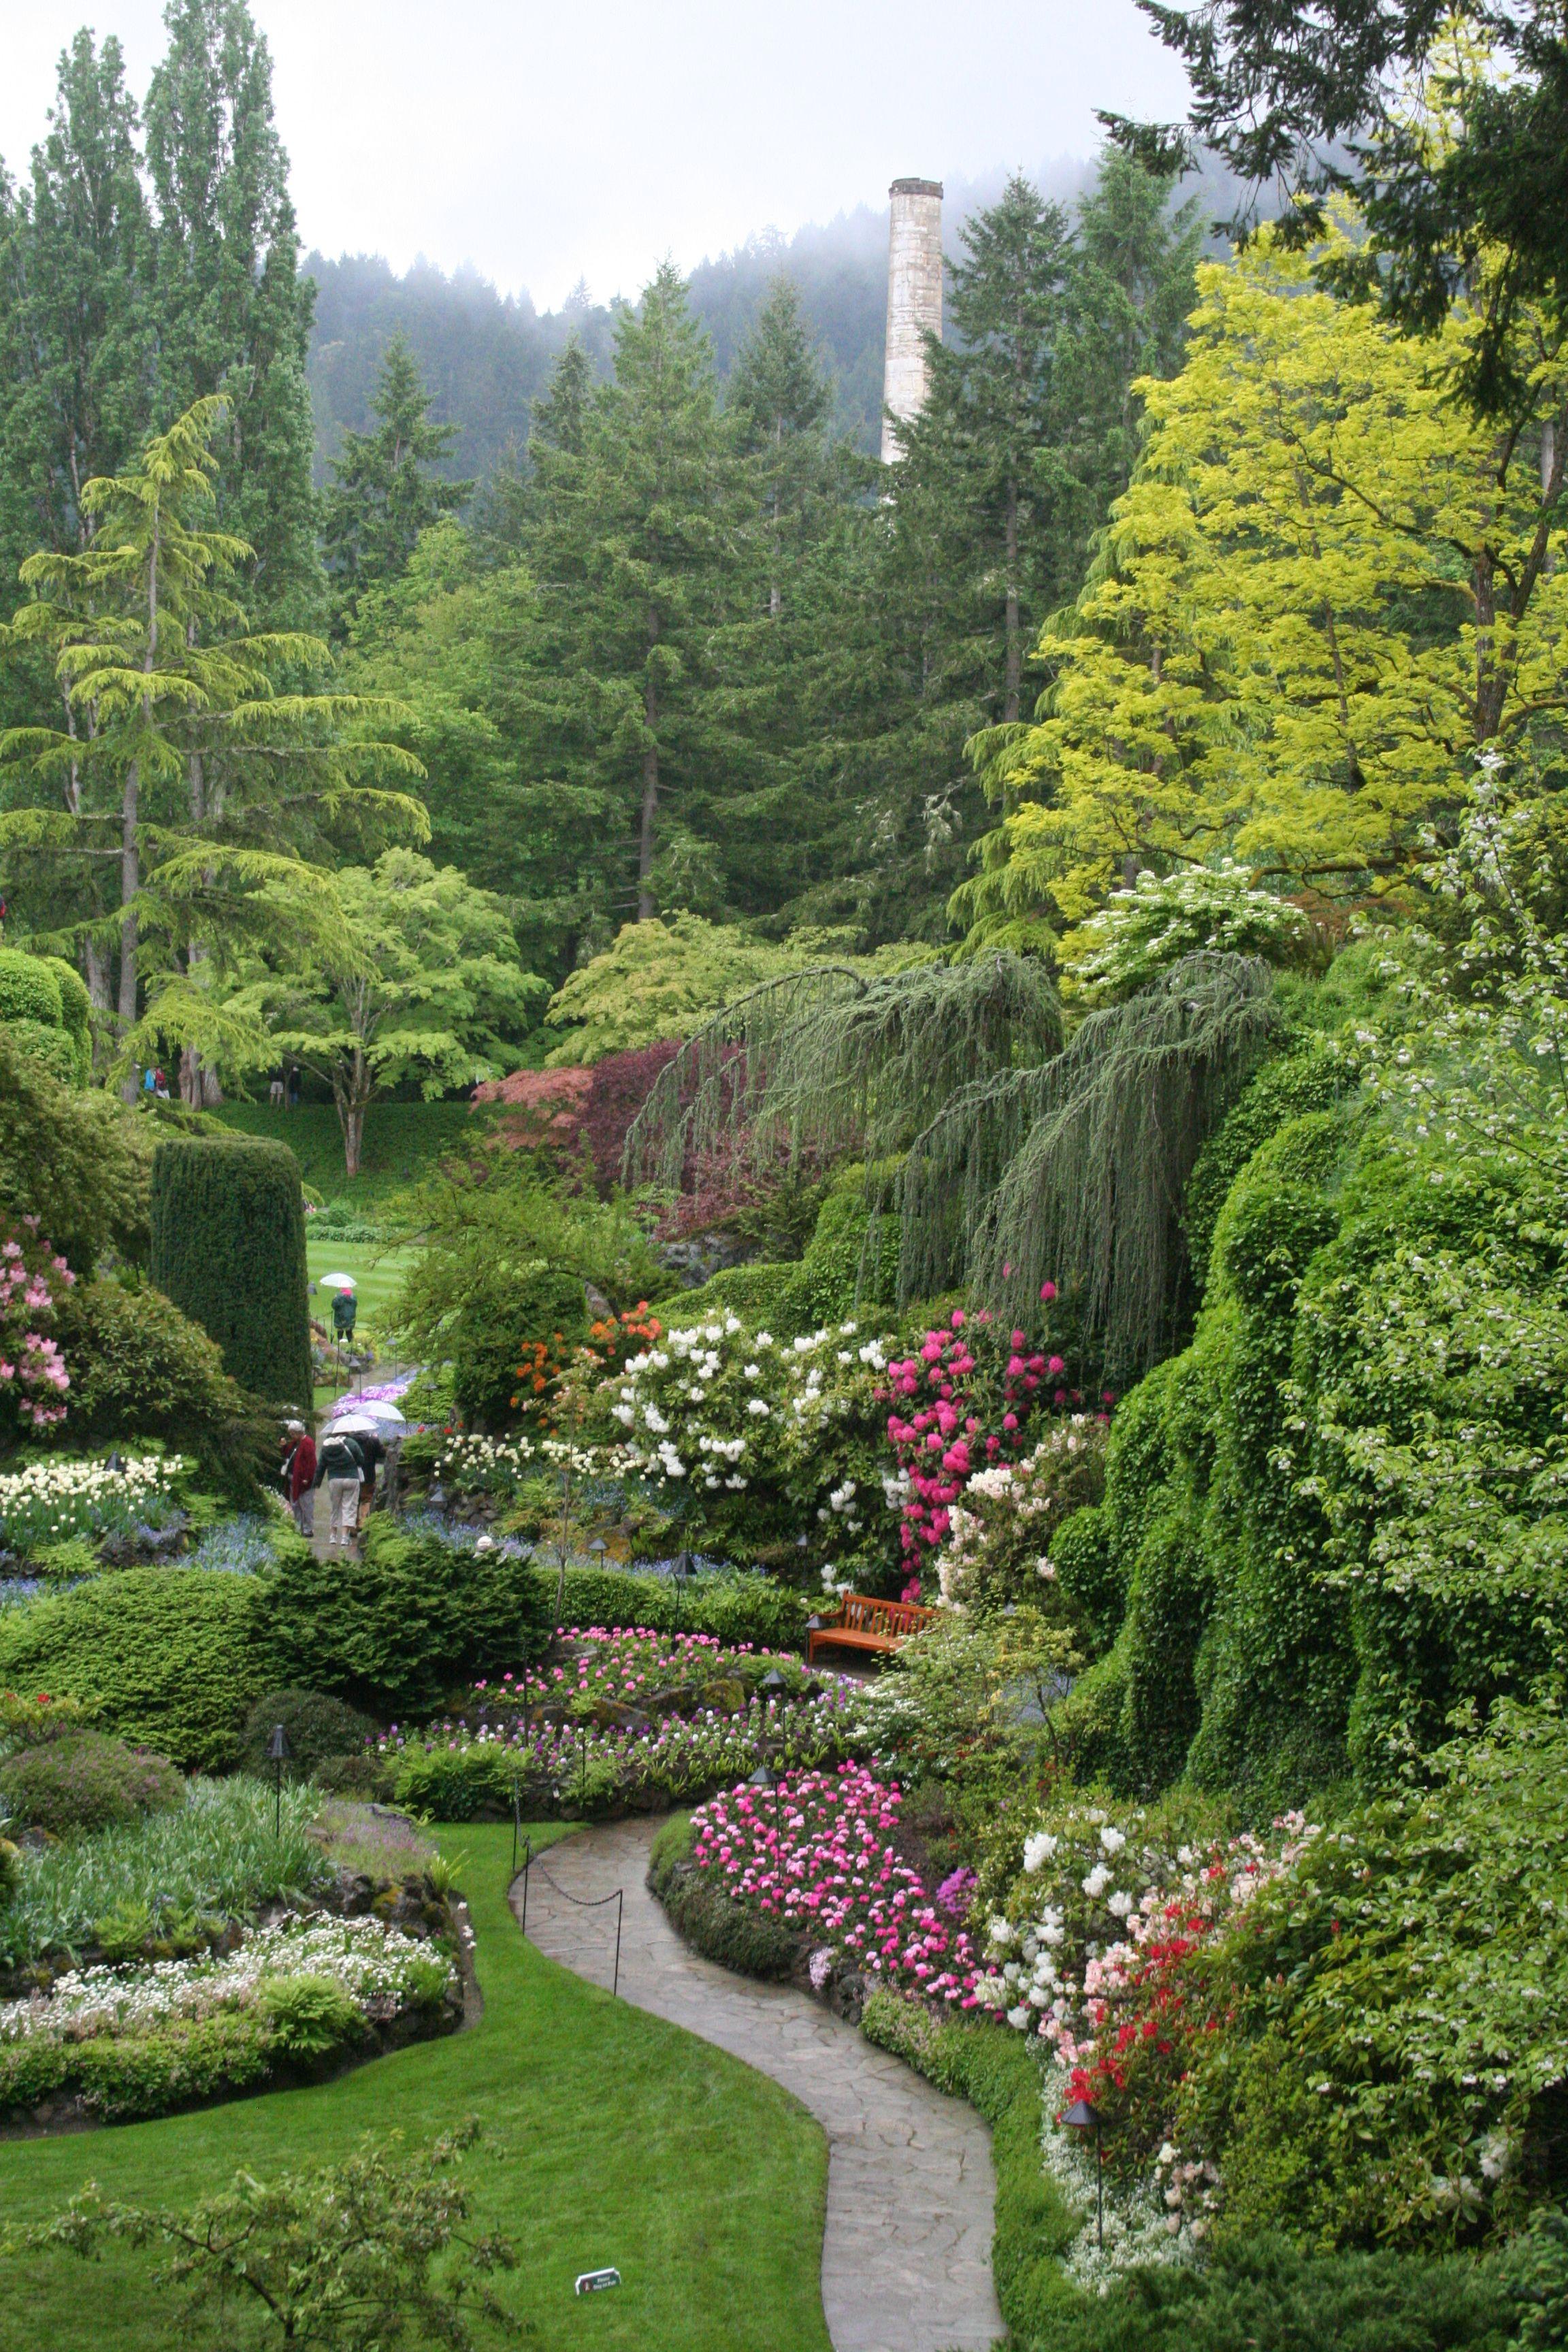 Buchart Gardens Canada by Patty McQuiston 2013 in